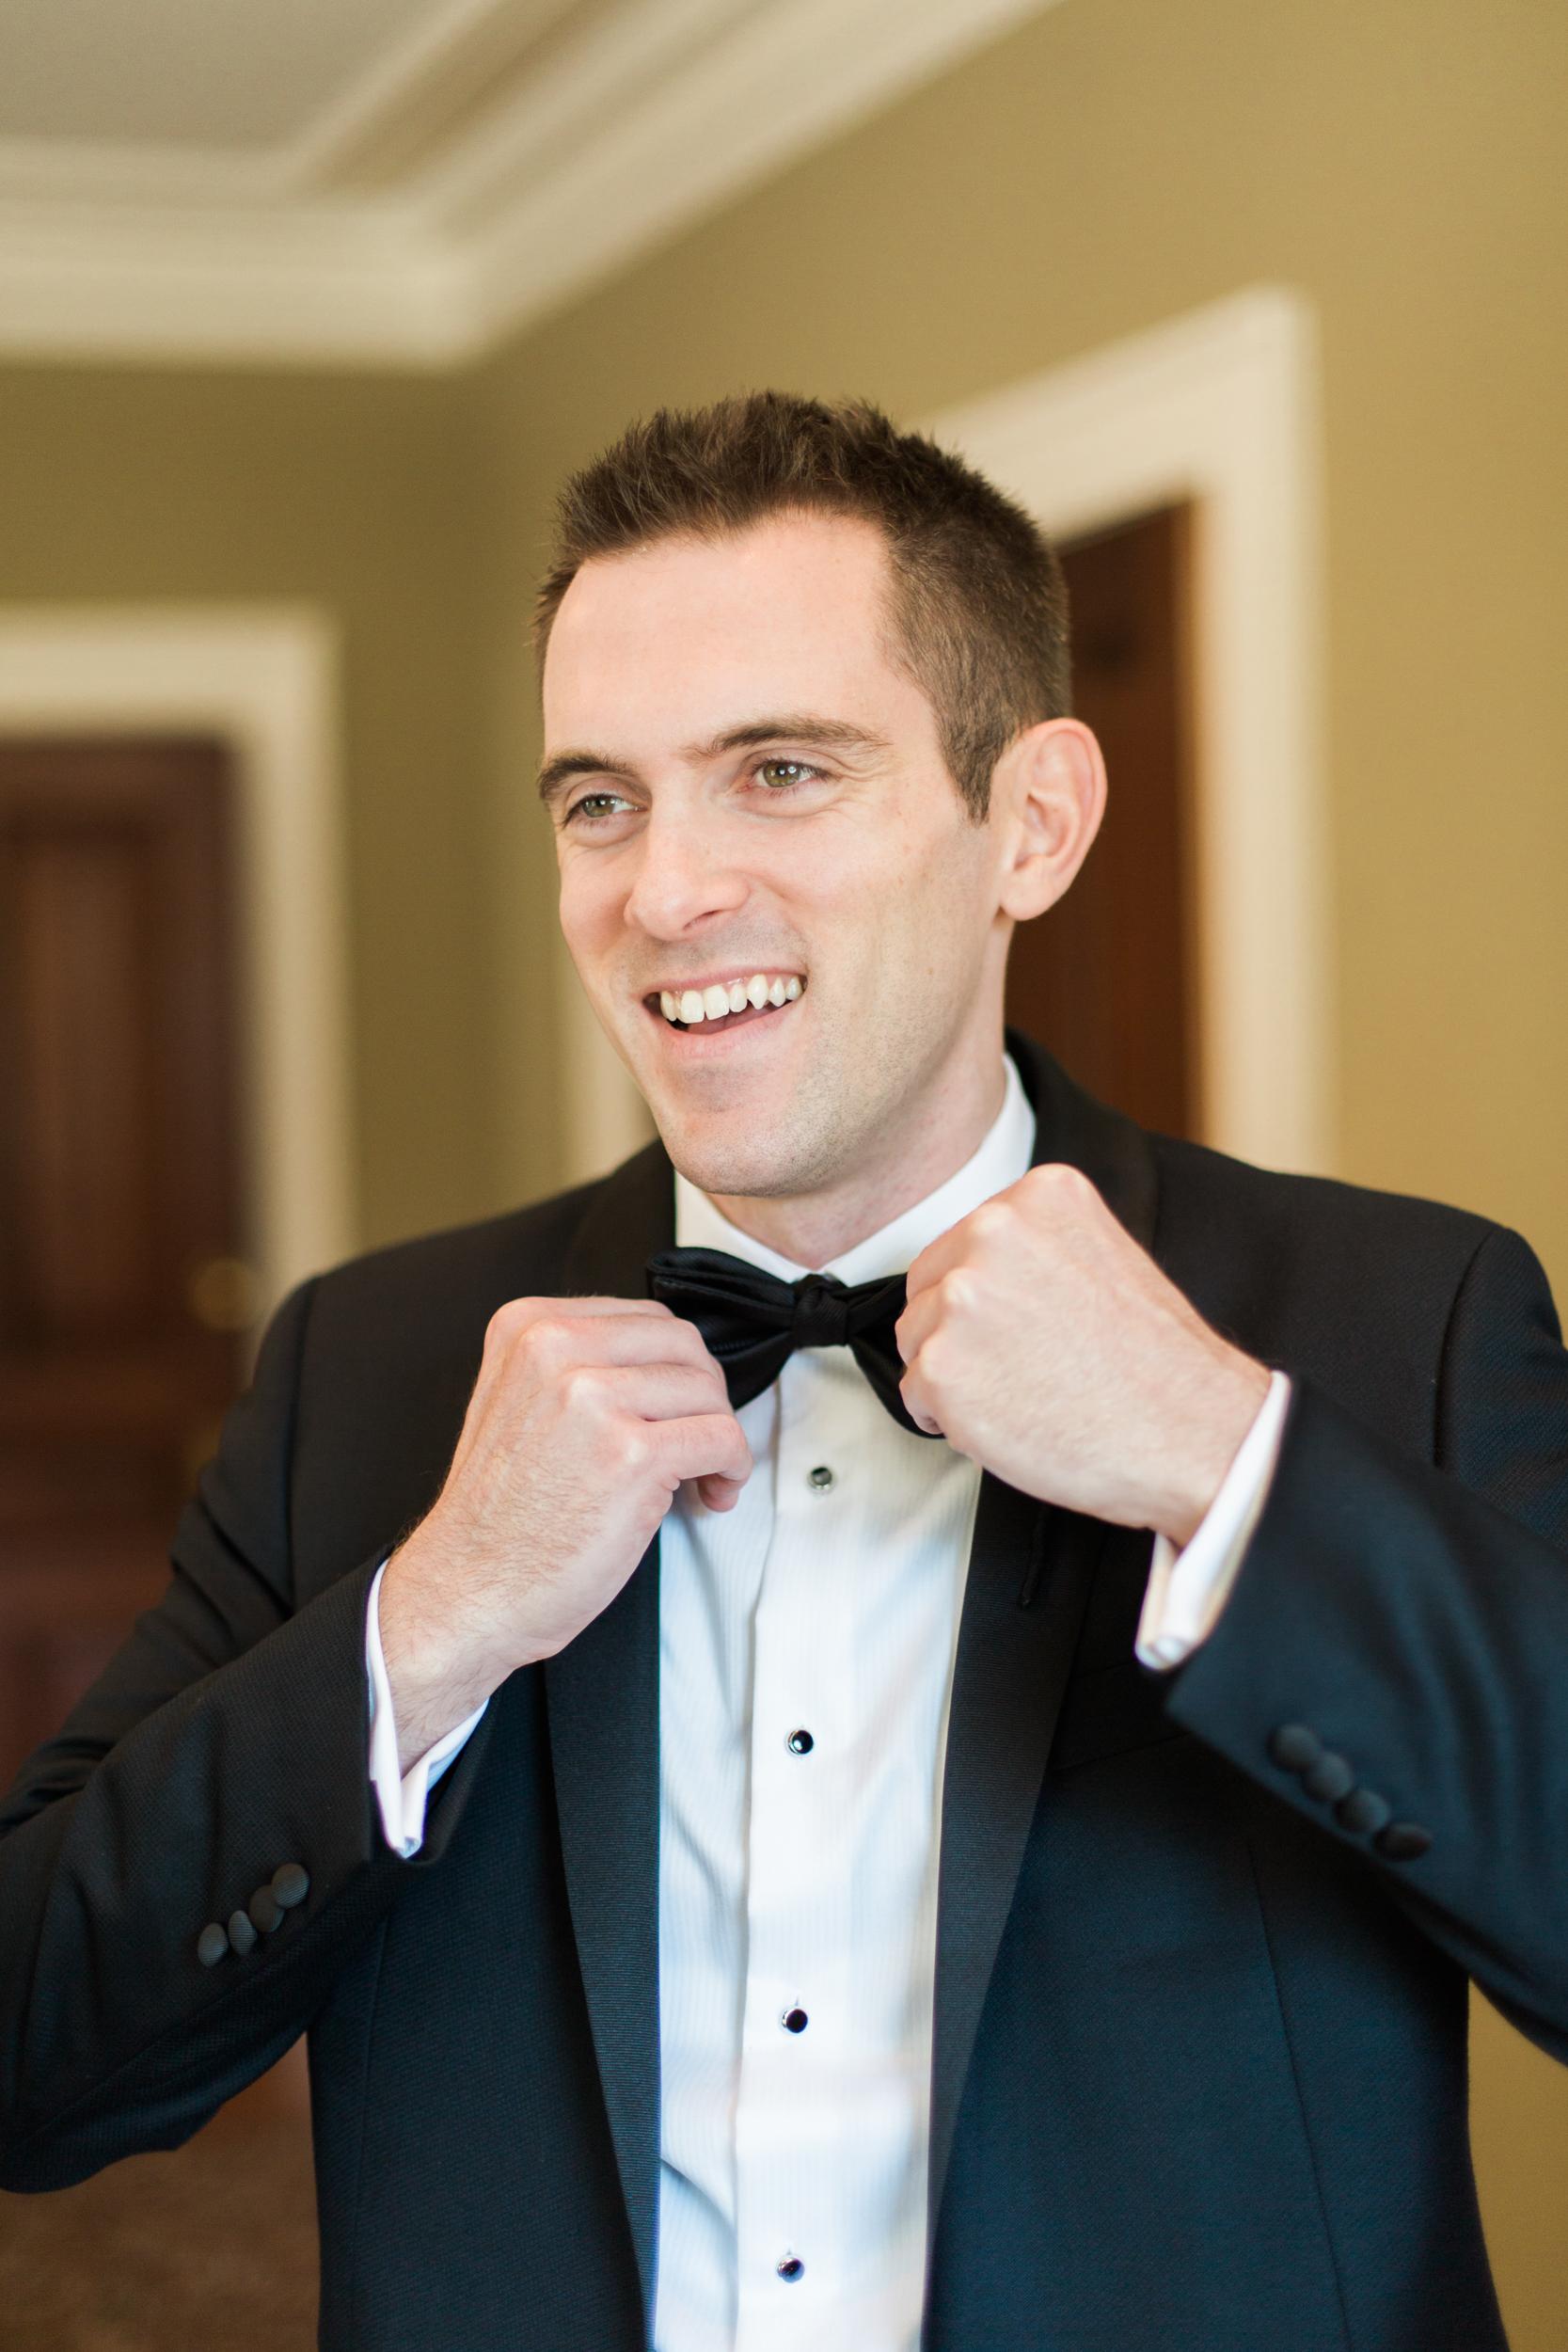 Berkshire County Wedding Photographer